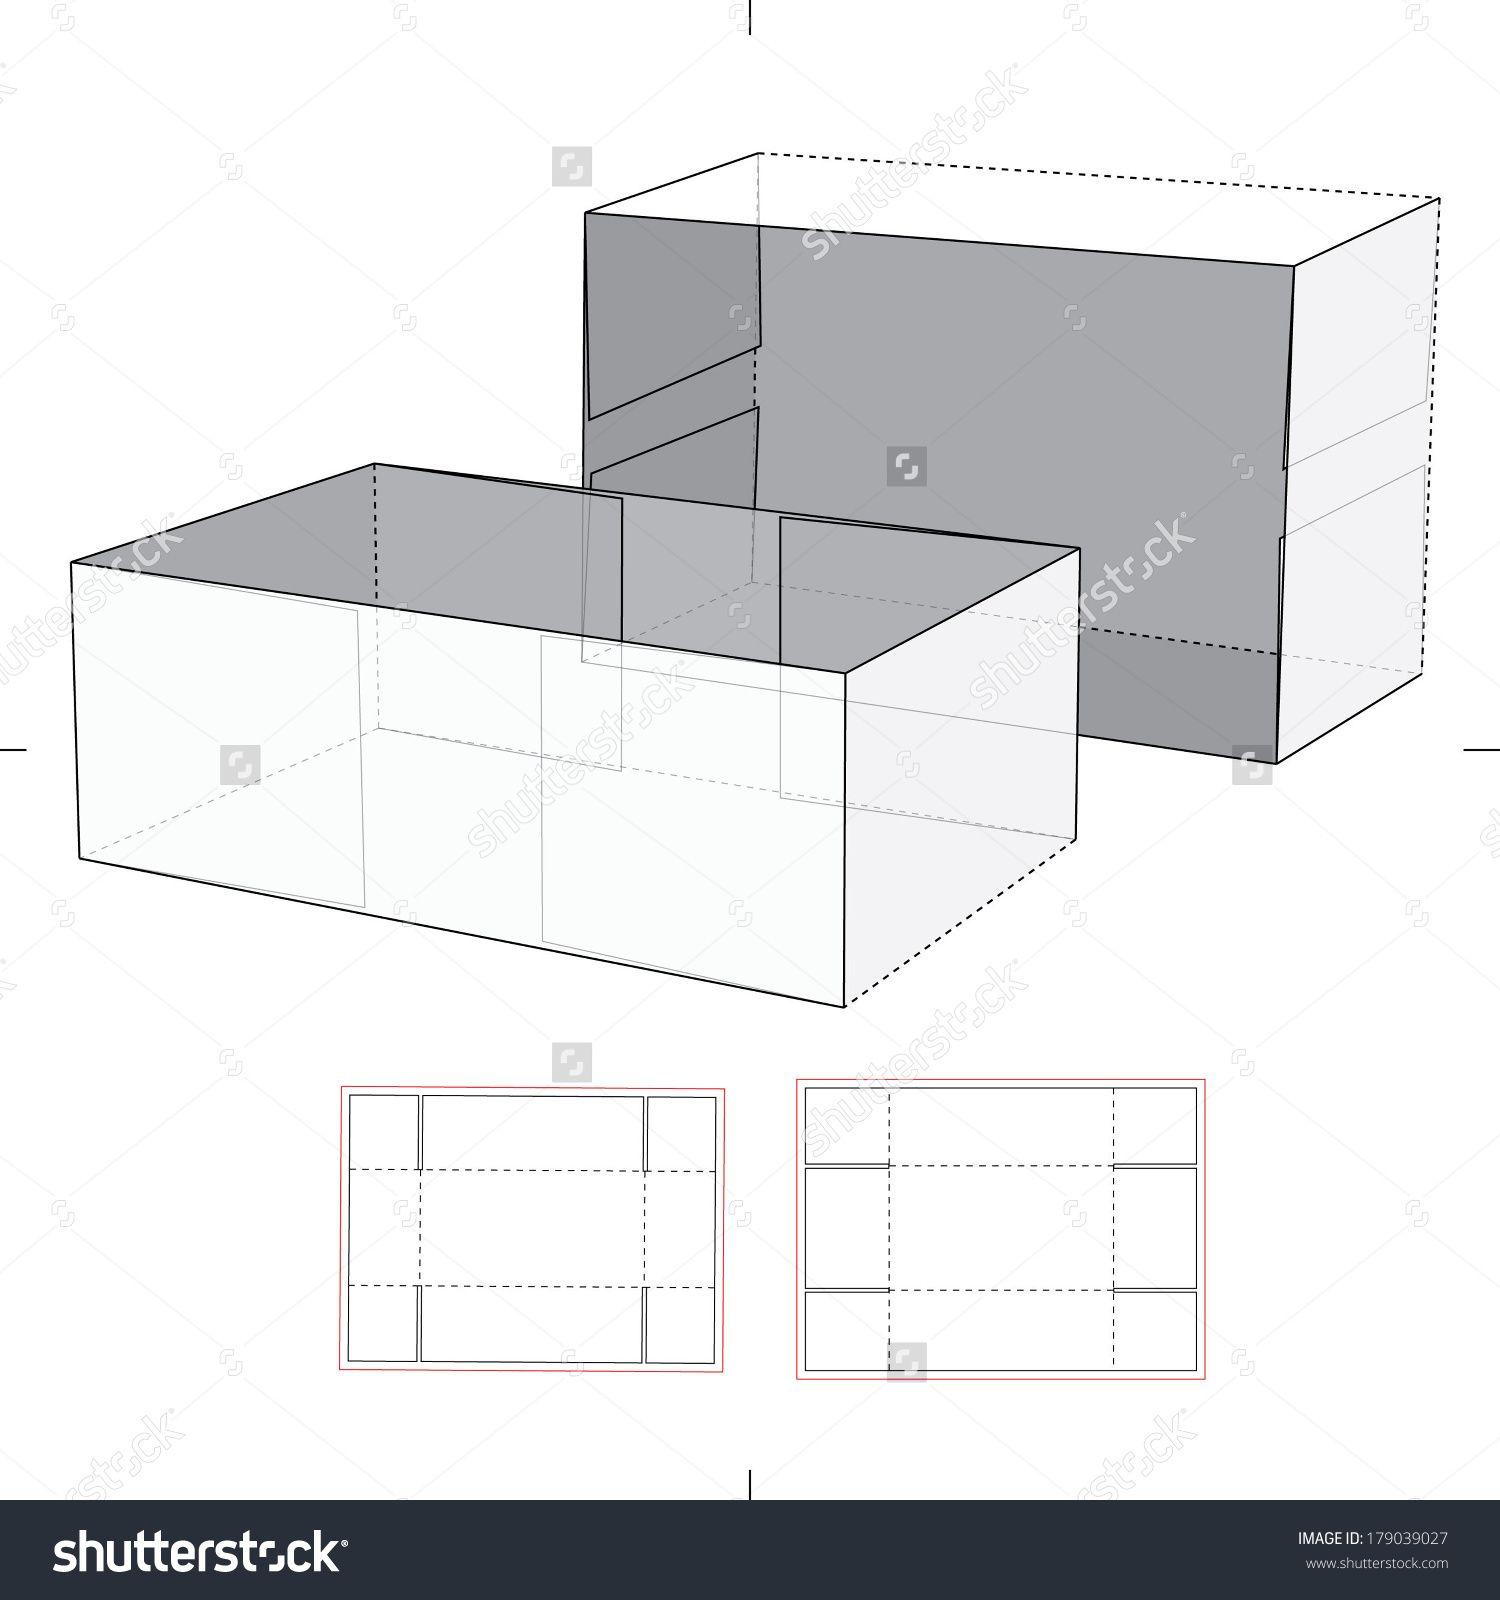 shoe box with die cut pattern stock vector illustration 179039027 shutterstock printable. Black Bedroom Furniture Sets. Home Design Ideas